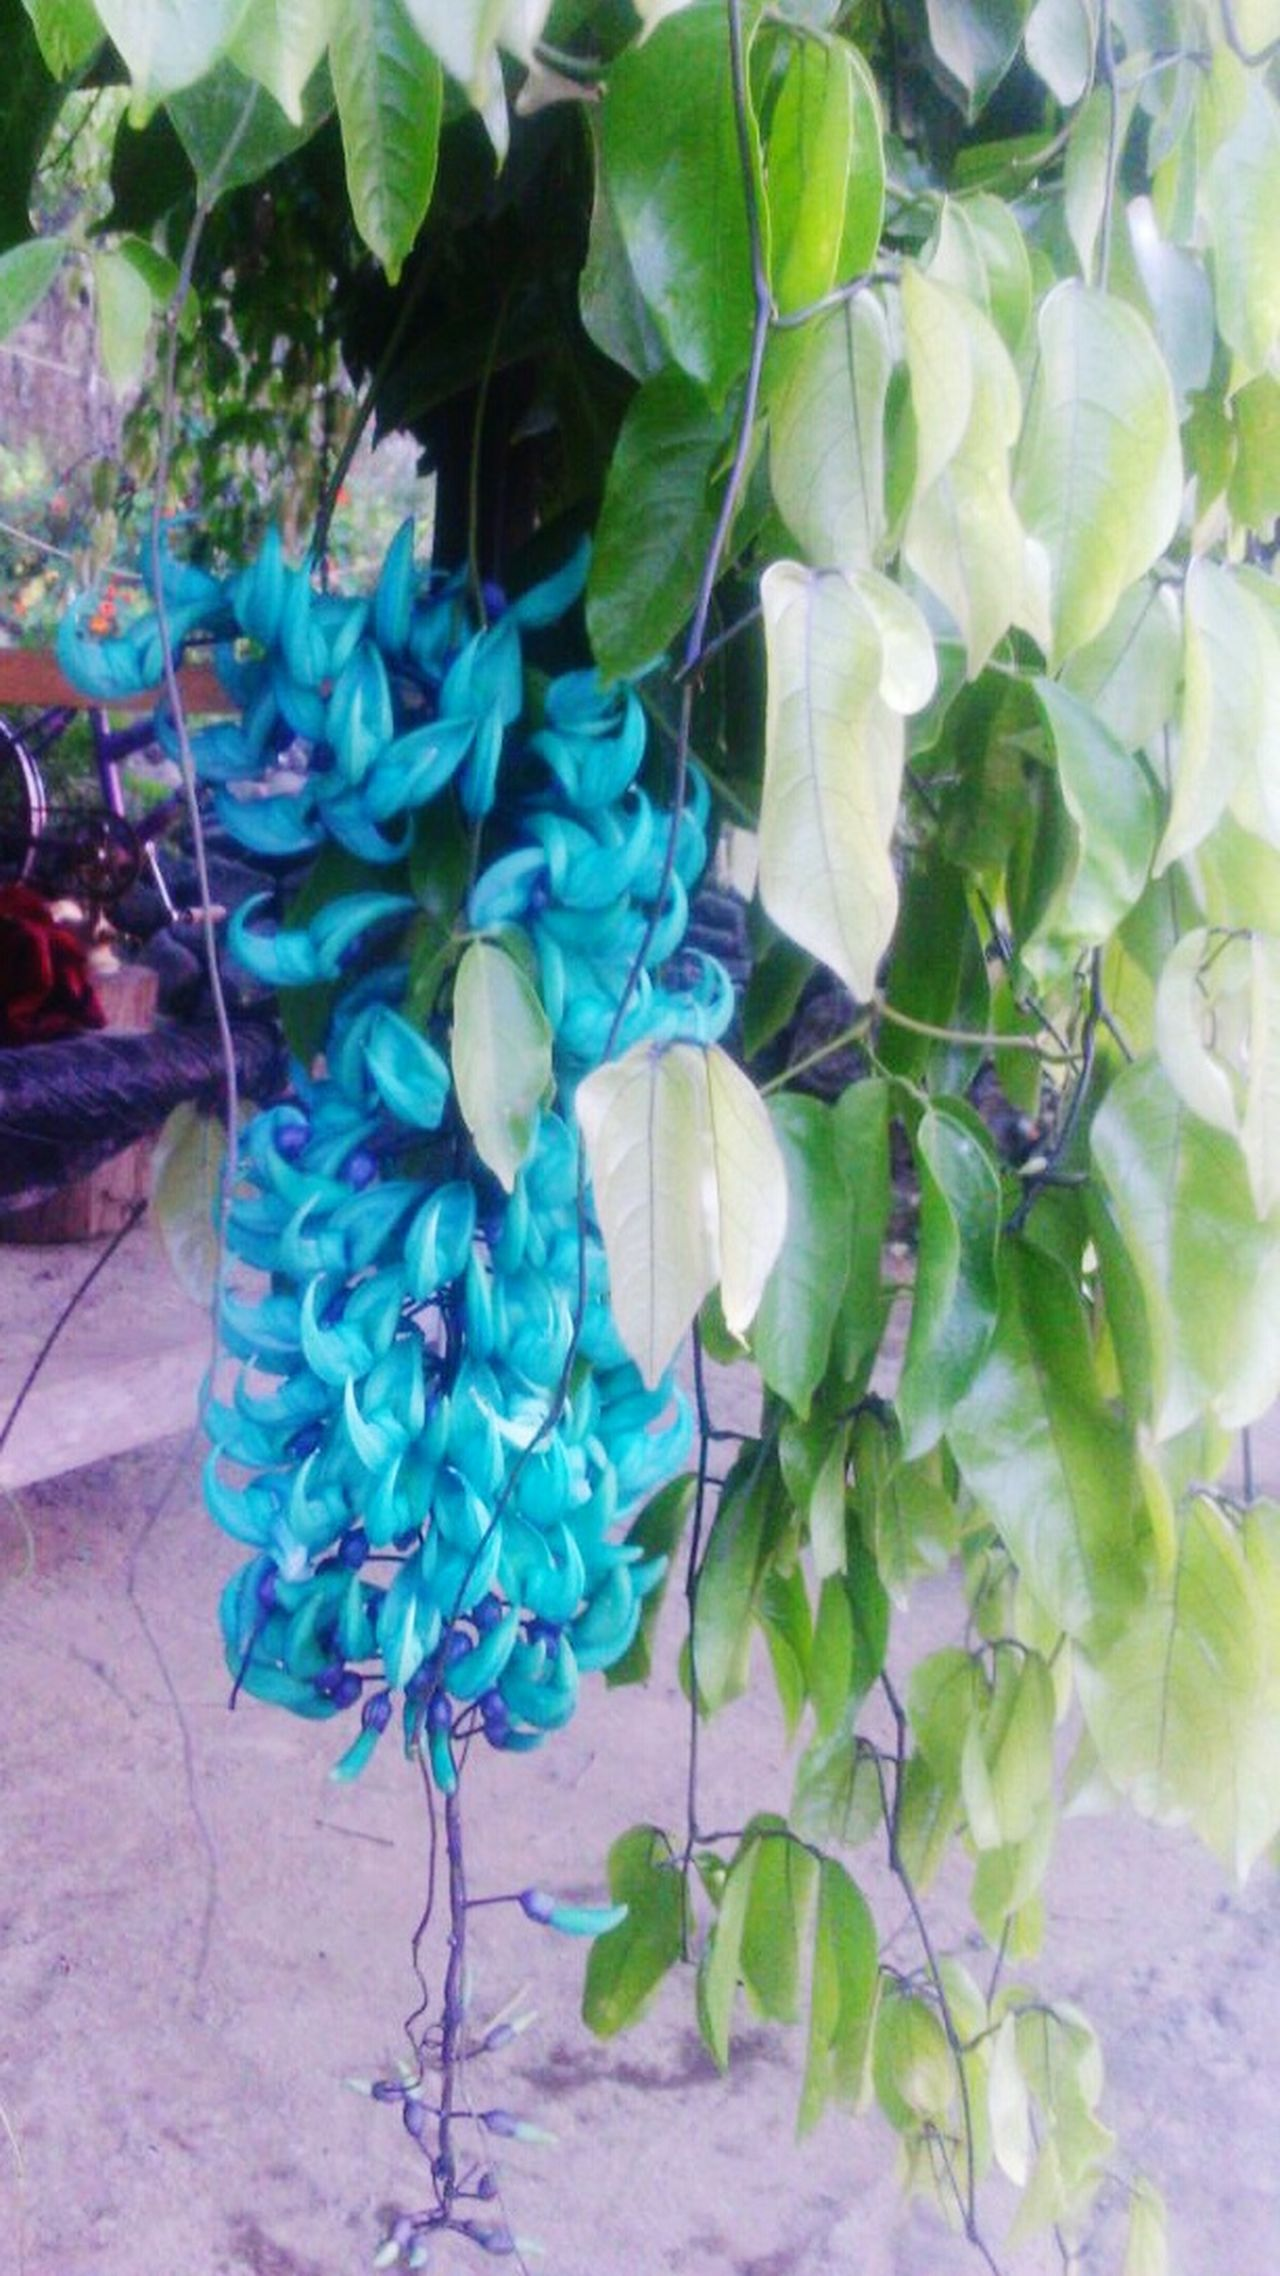 Plant Multi Colored No People Leaf Outdoors Day Flower Close-up Nature thumbergia jade Guatemala Antigua, Guatemala